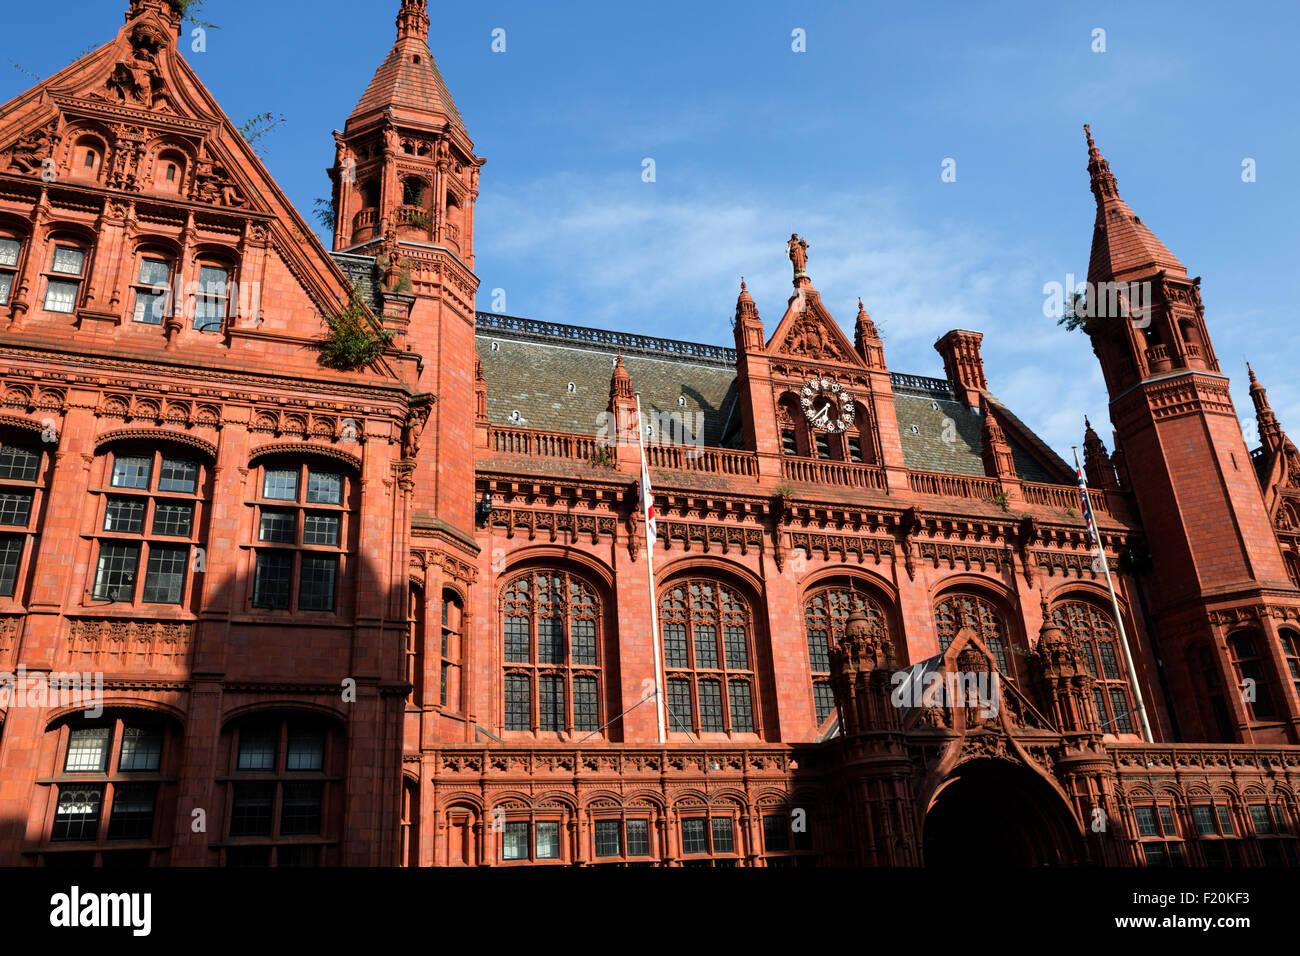 Victoria Law Courts, Corporation Street, Birmingham, West Midlands, England, United Kingdom, Europe - Stock Image